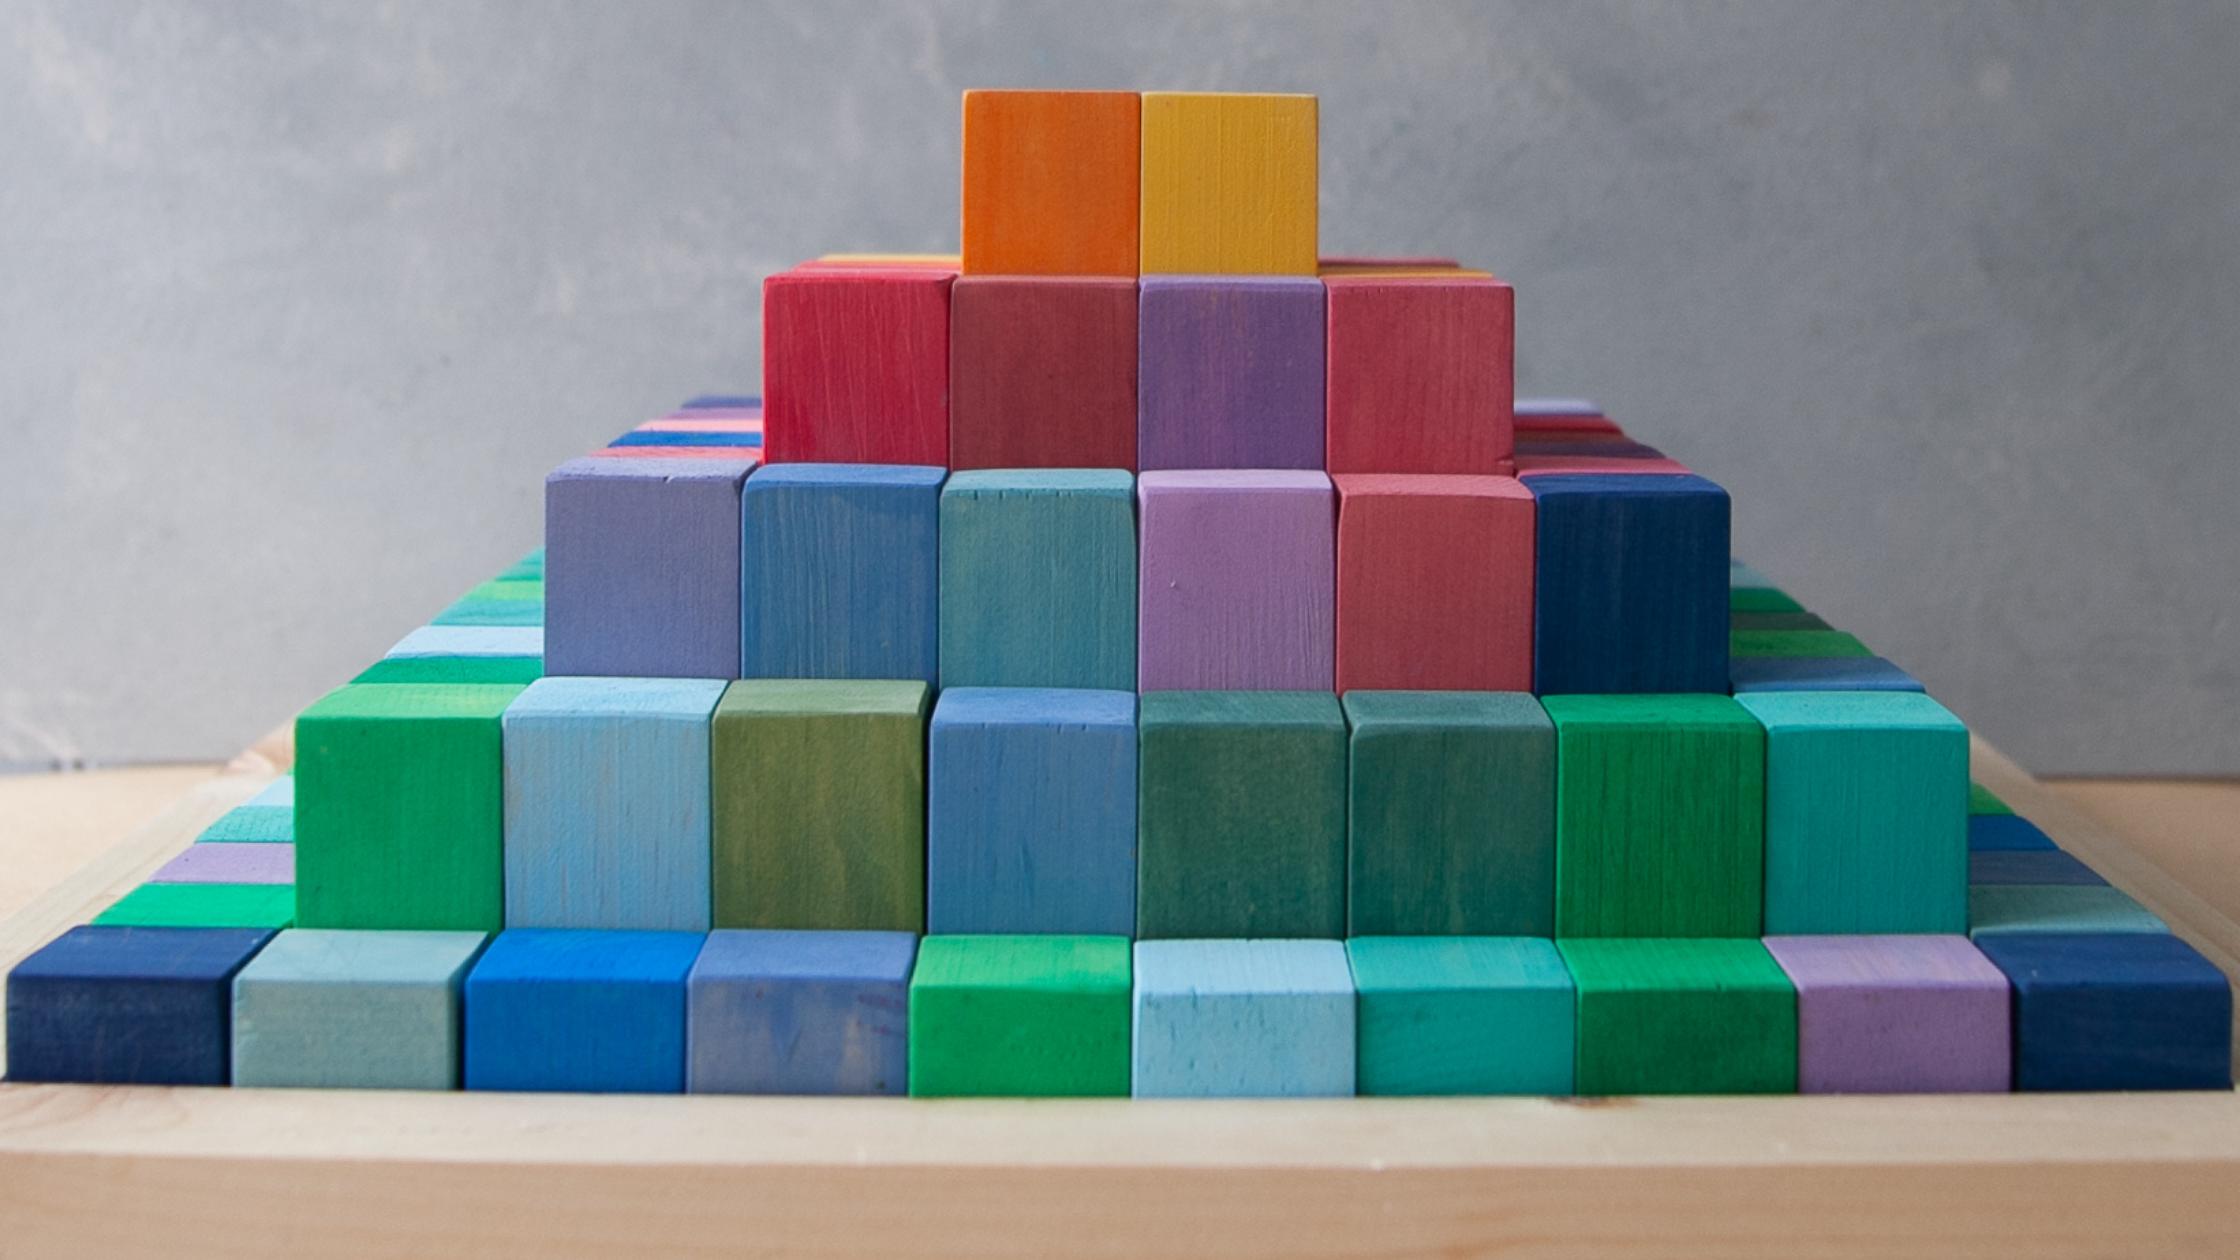 diy math building blocks